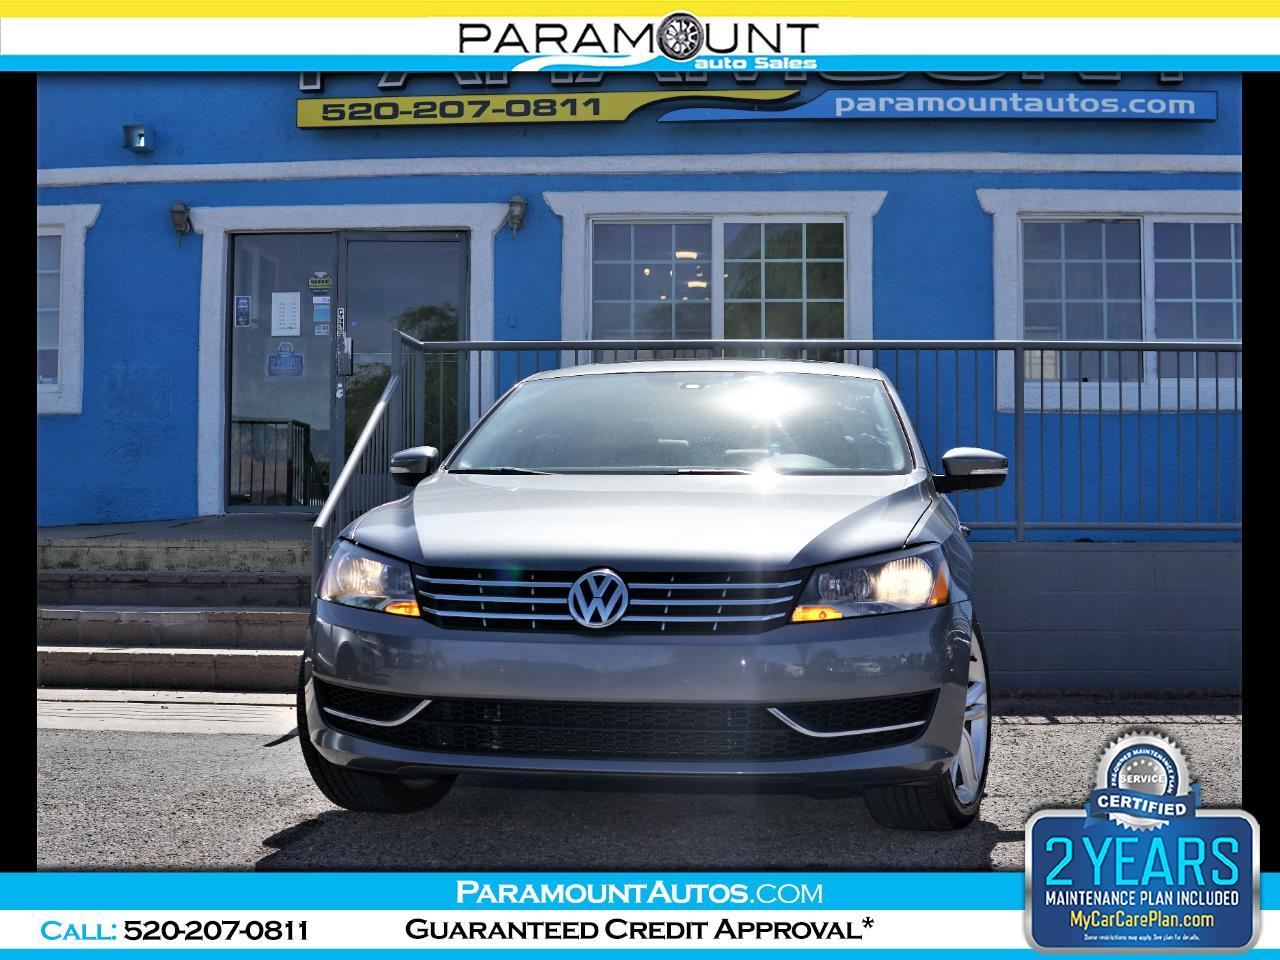 Volkswagen Passat 4dr Sdn 2.0L DSG TDI SE w/Sunroof 2014